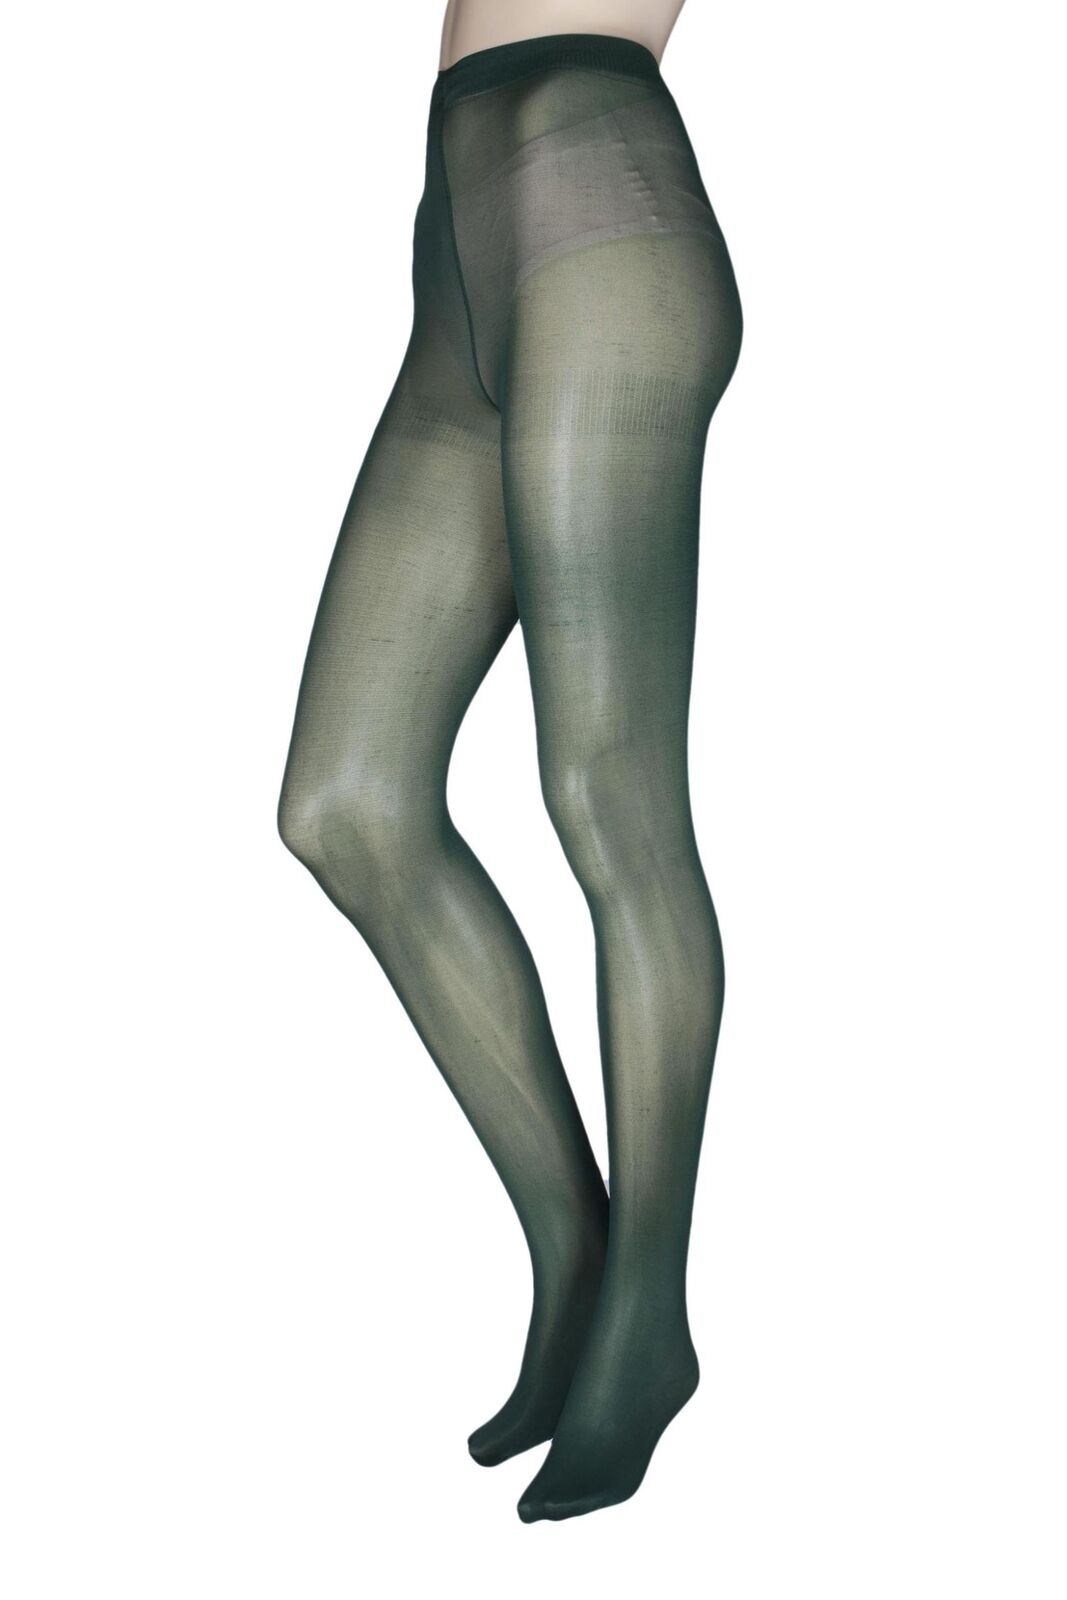 Pretty Polly Opaque Tights 100 Denier Super Soft Black Opaque Tights BNIB